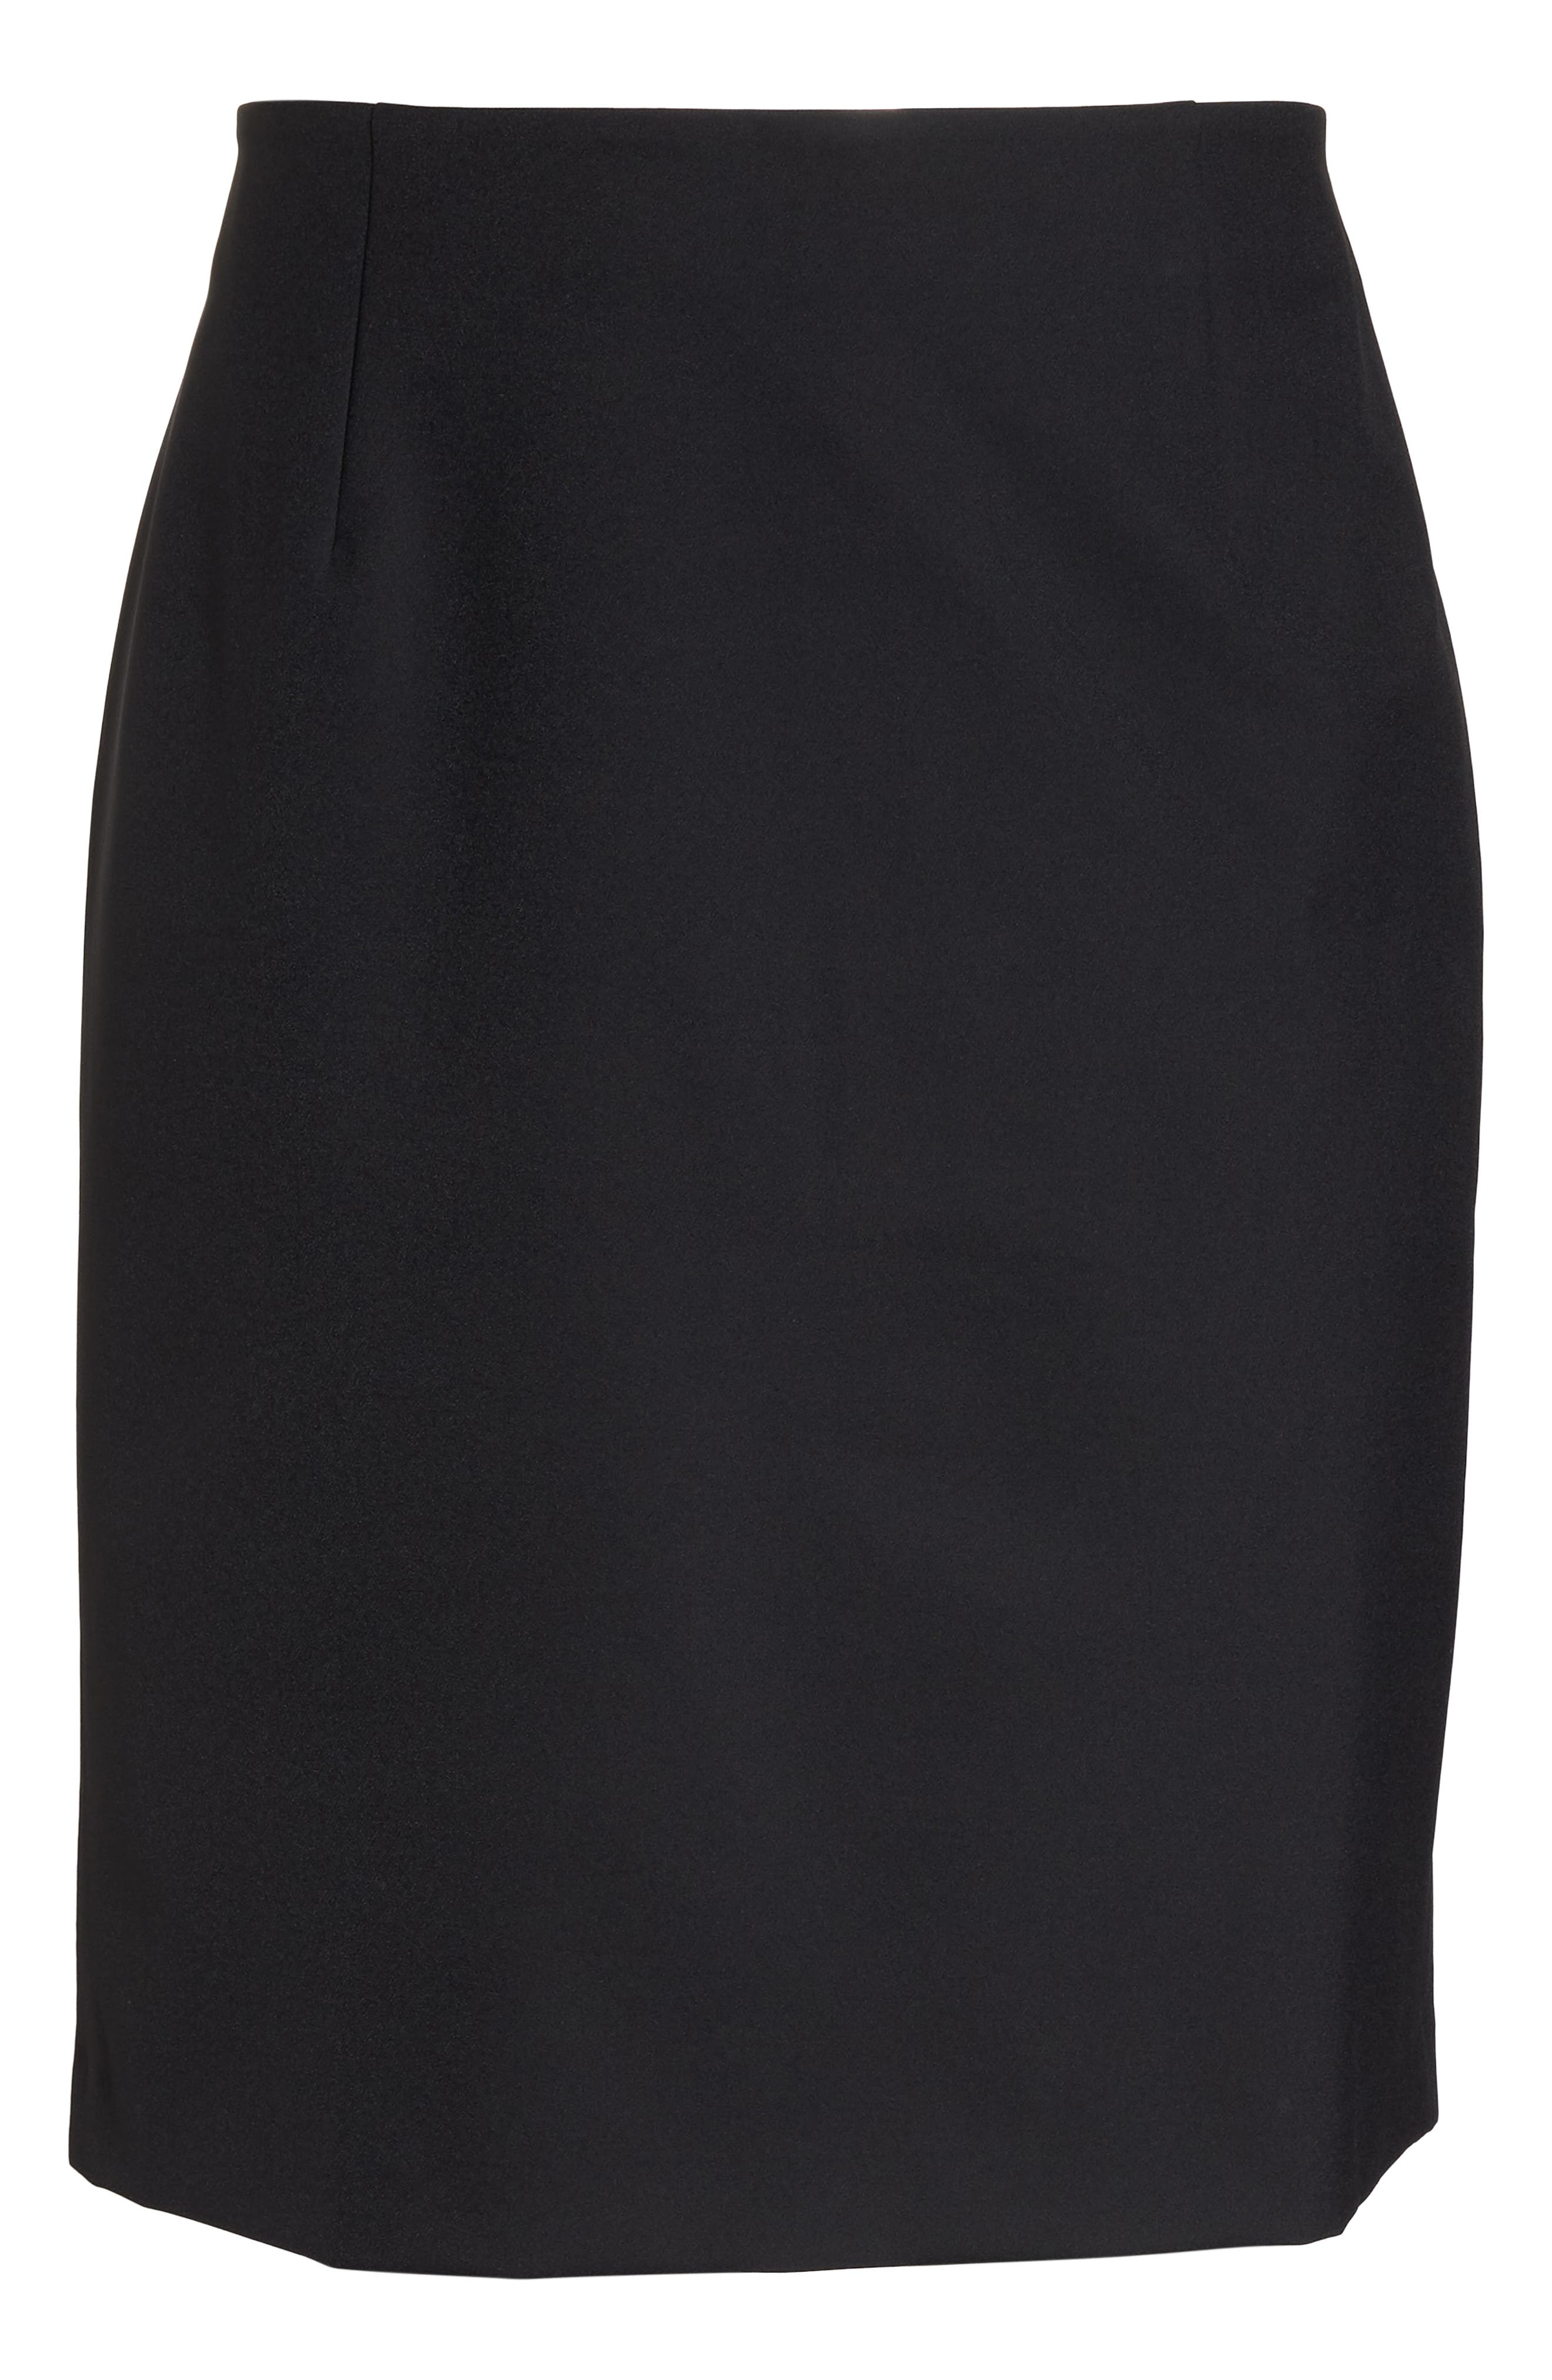 Pencil Skirt,                             Alternate thumbnail 12, color,                             BLACK